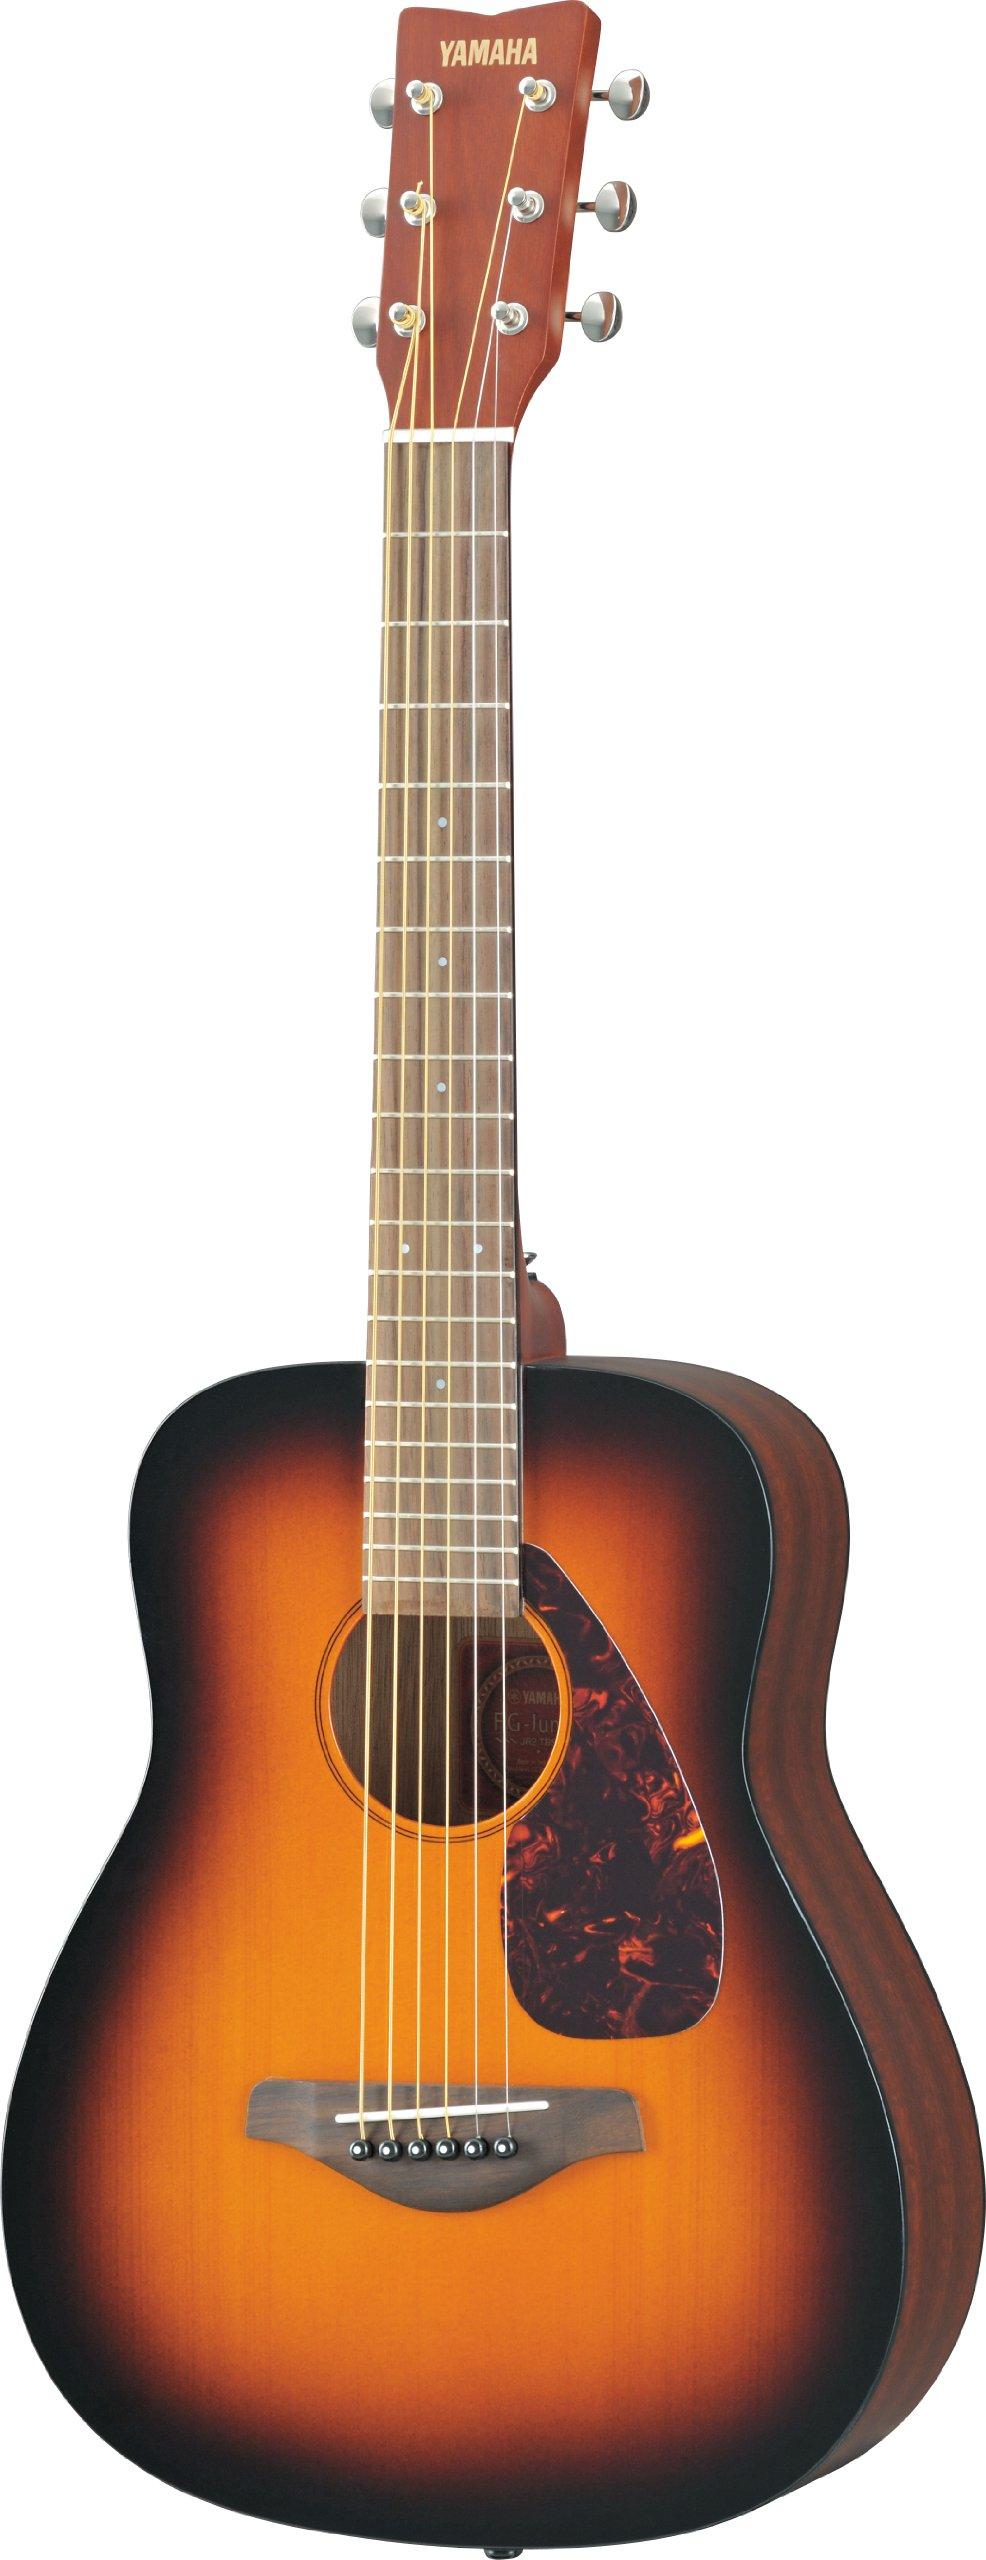 Yamaha JR2TBS 3/4 Scale Guitar Tobacco Sunburst